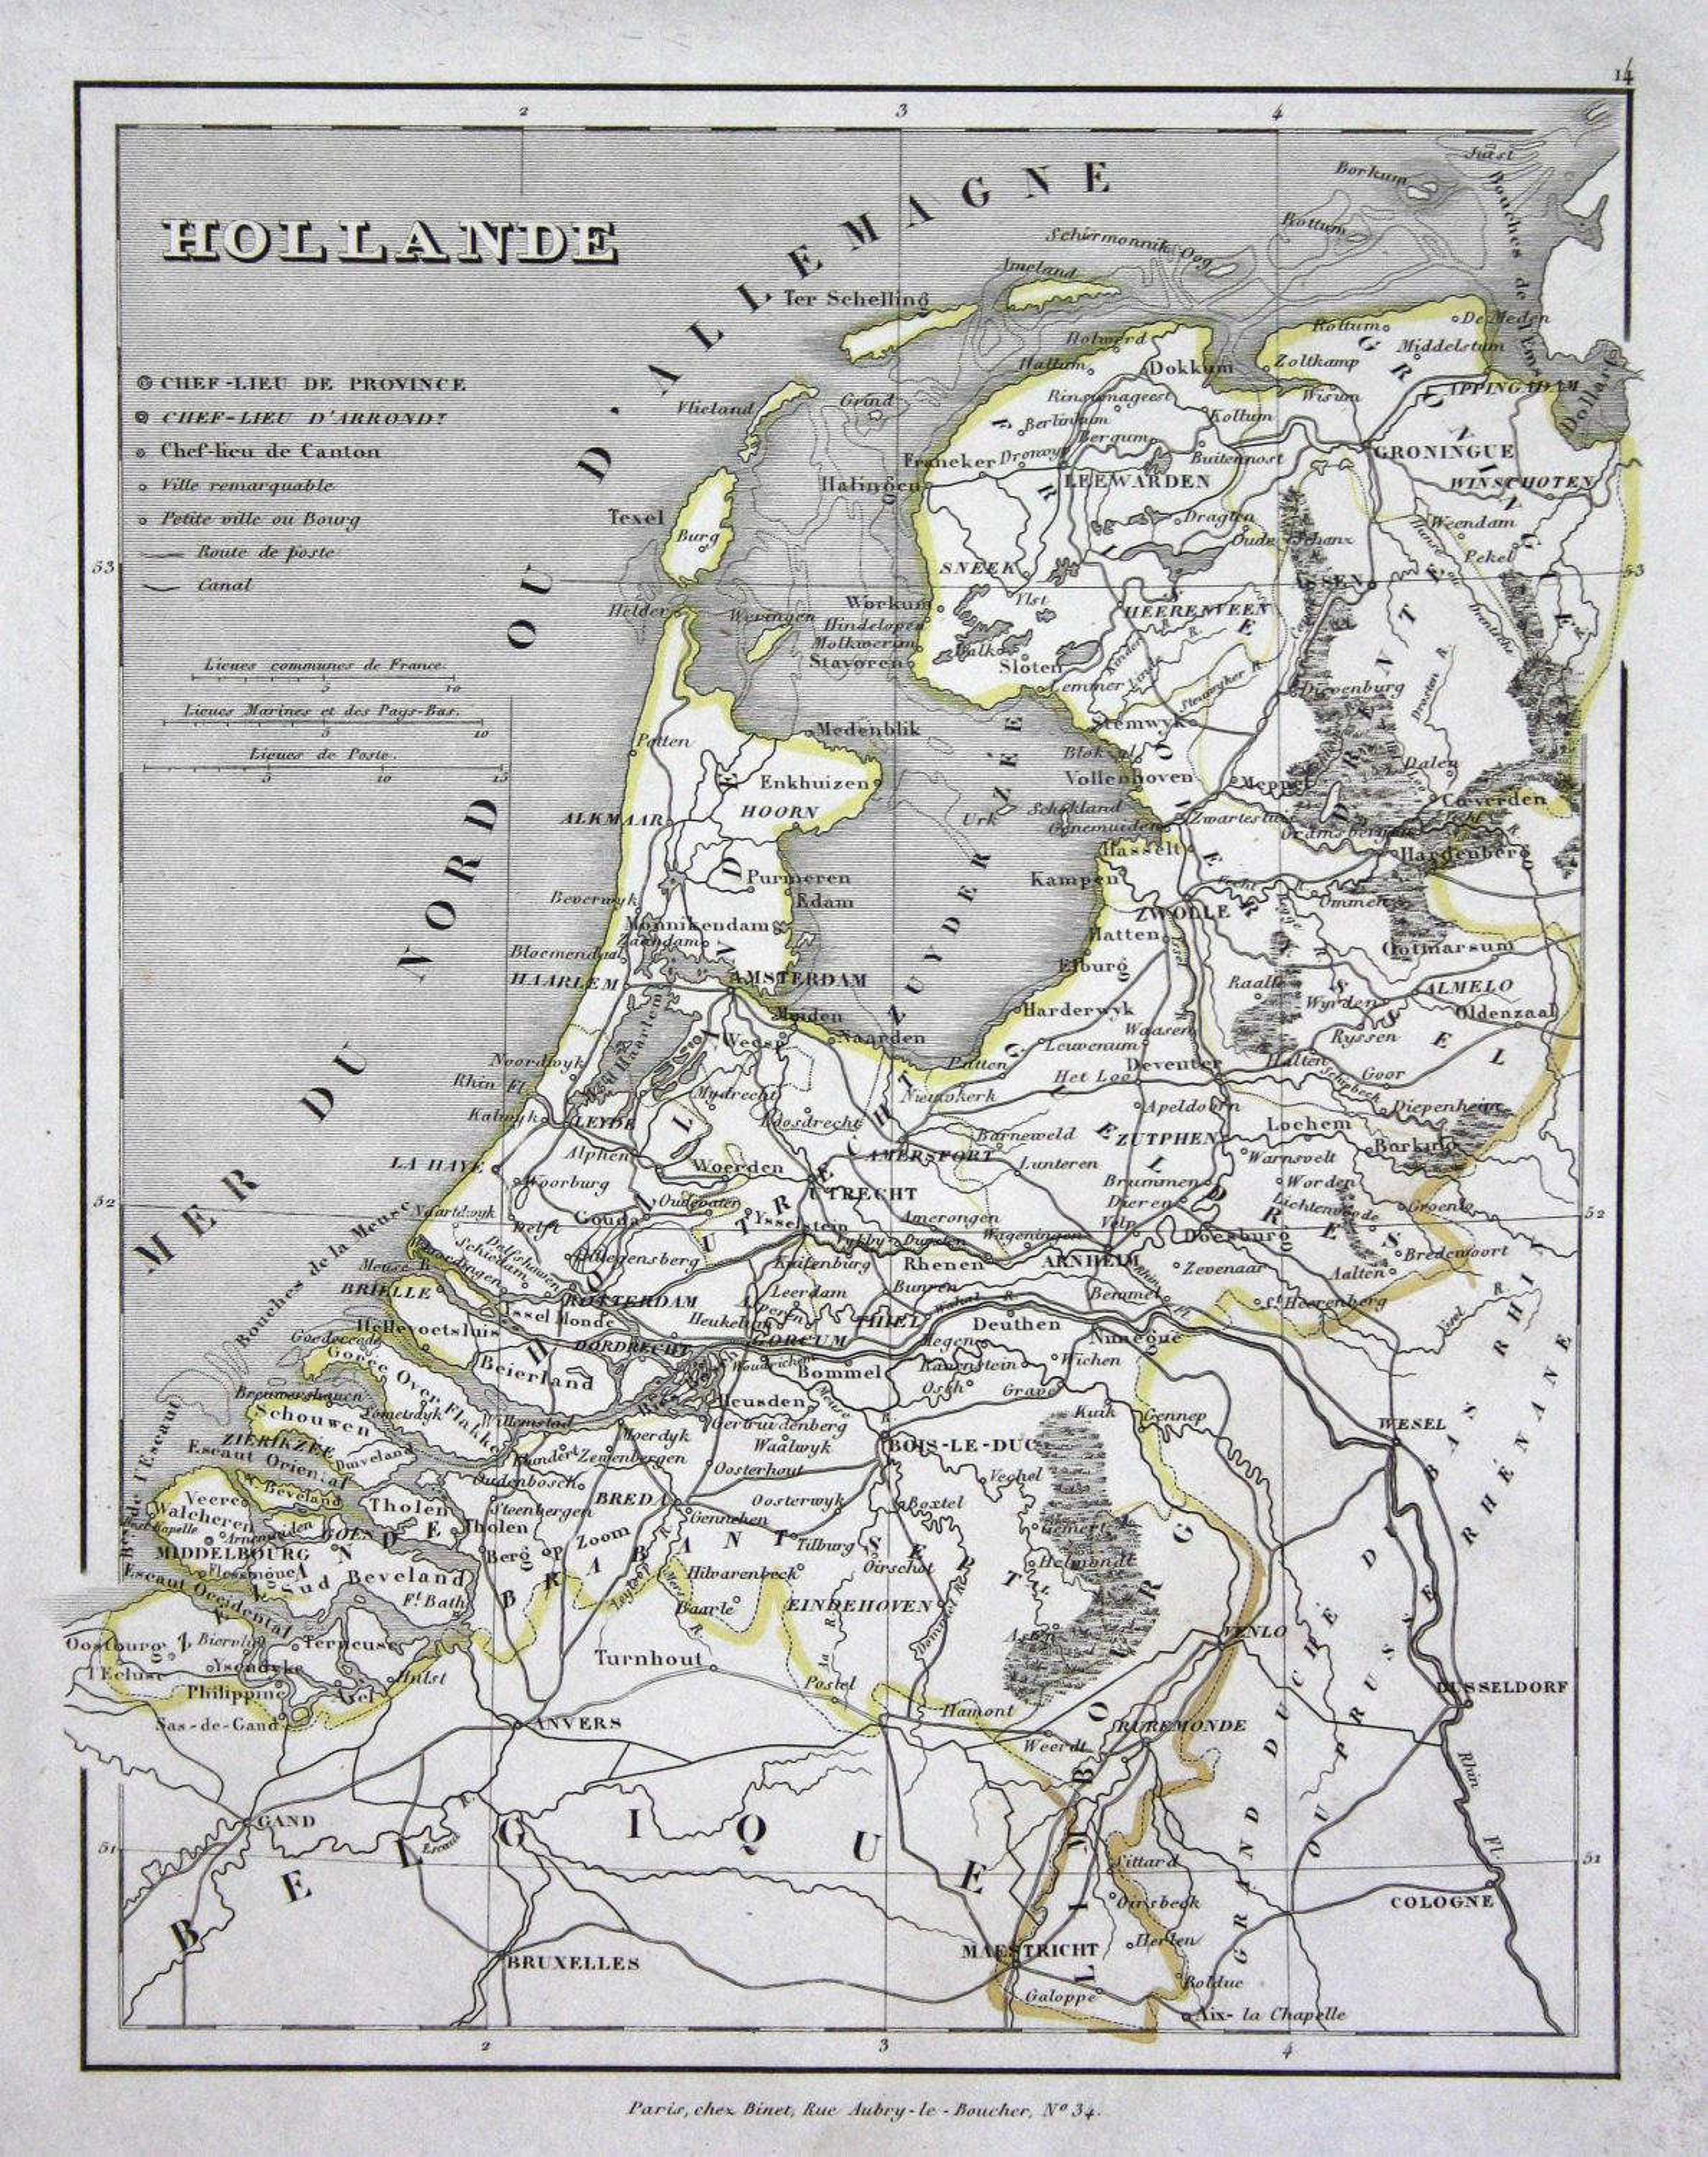 Flughafen D303274sseldorf Karte.Niederlande Karte